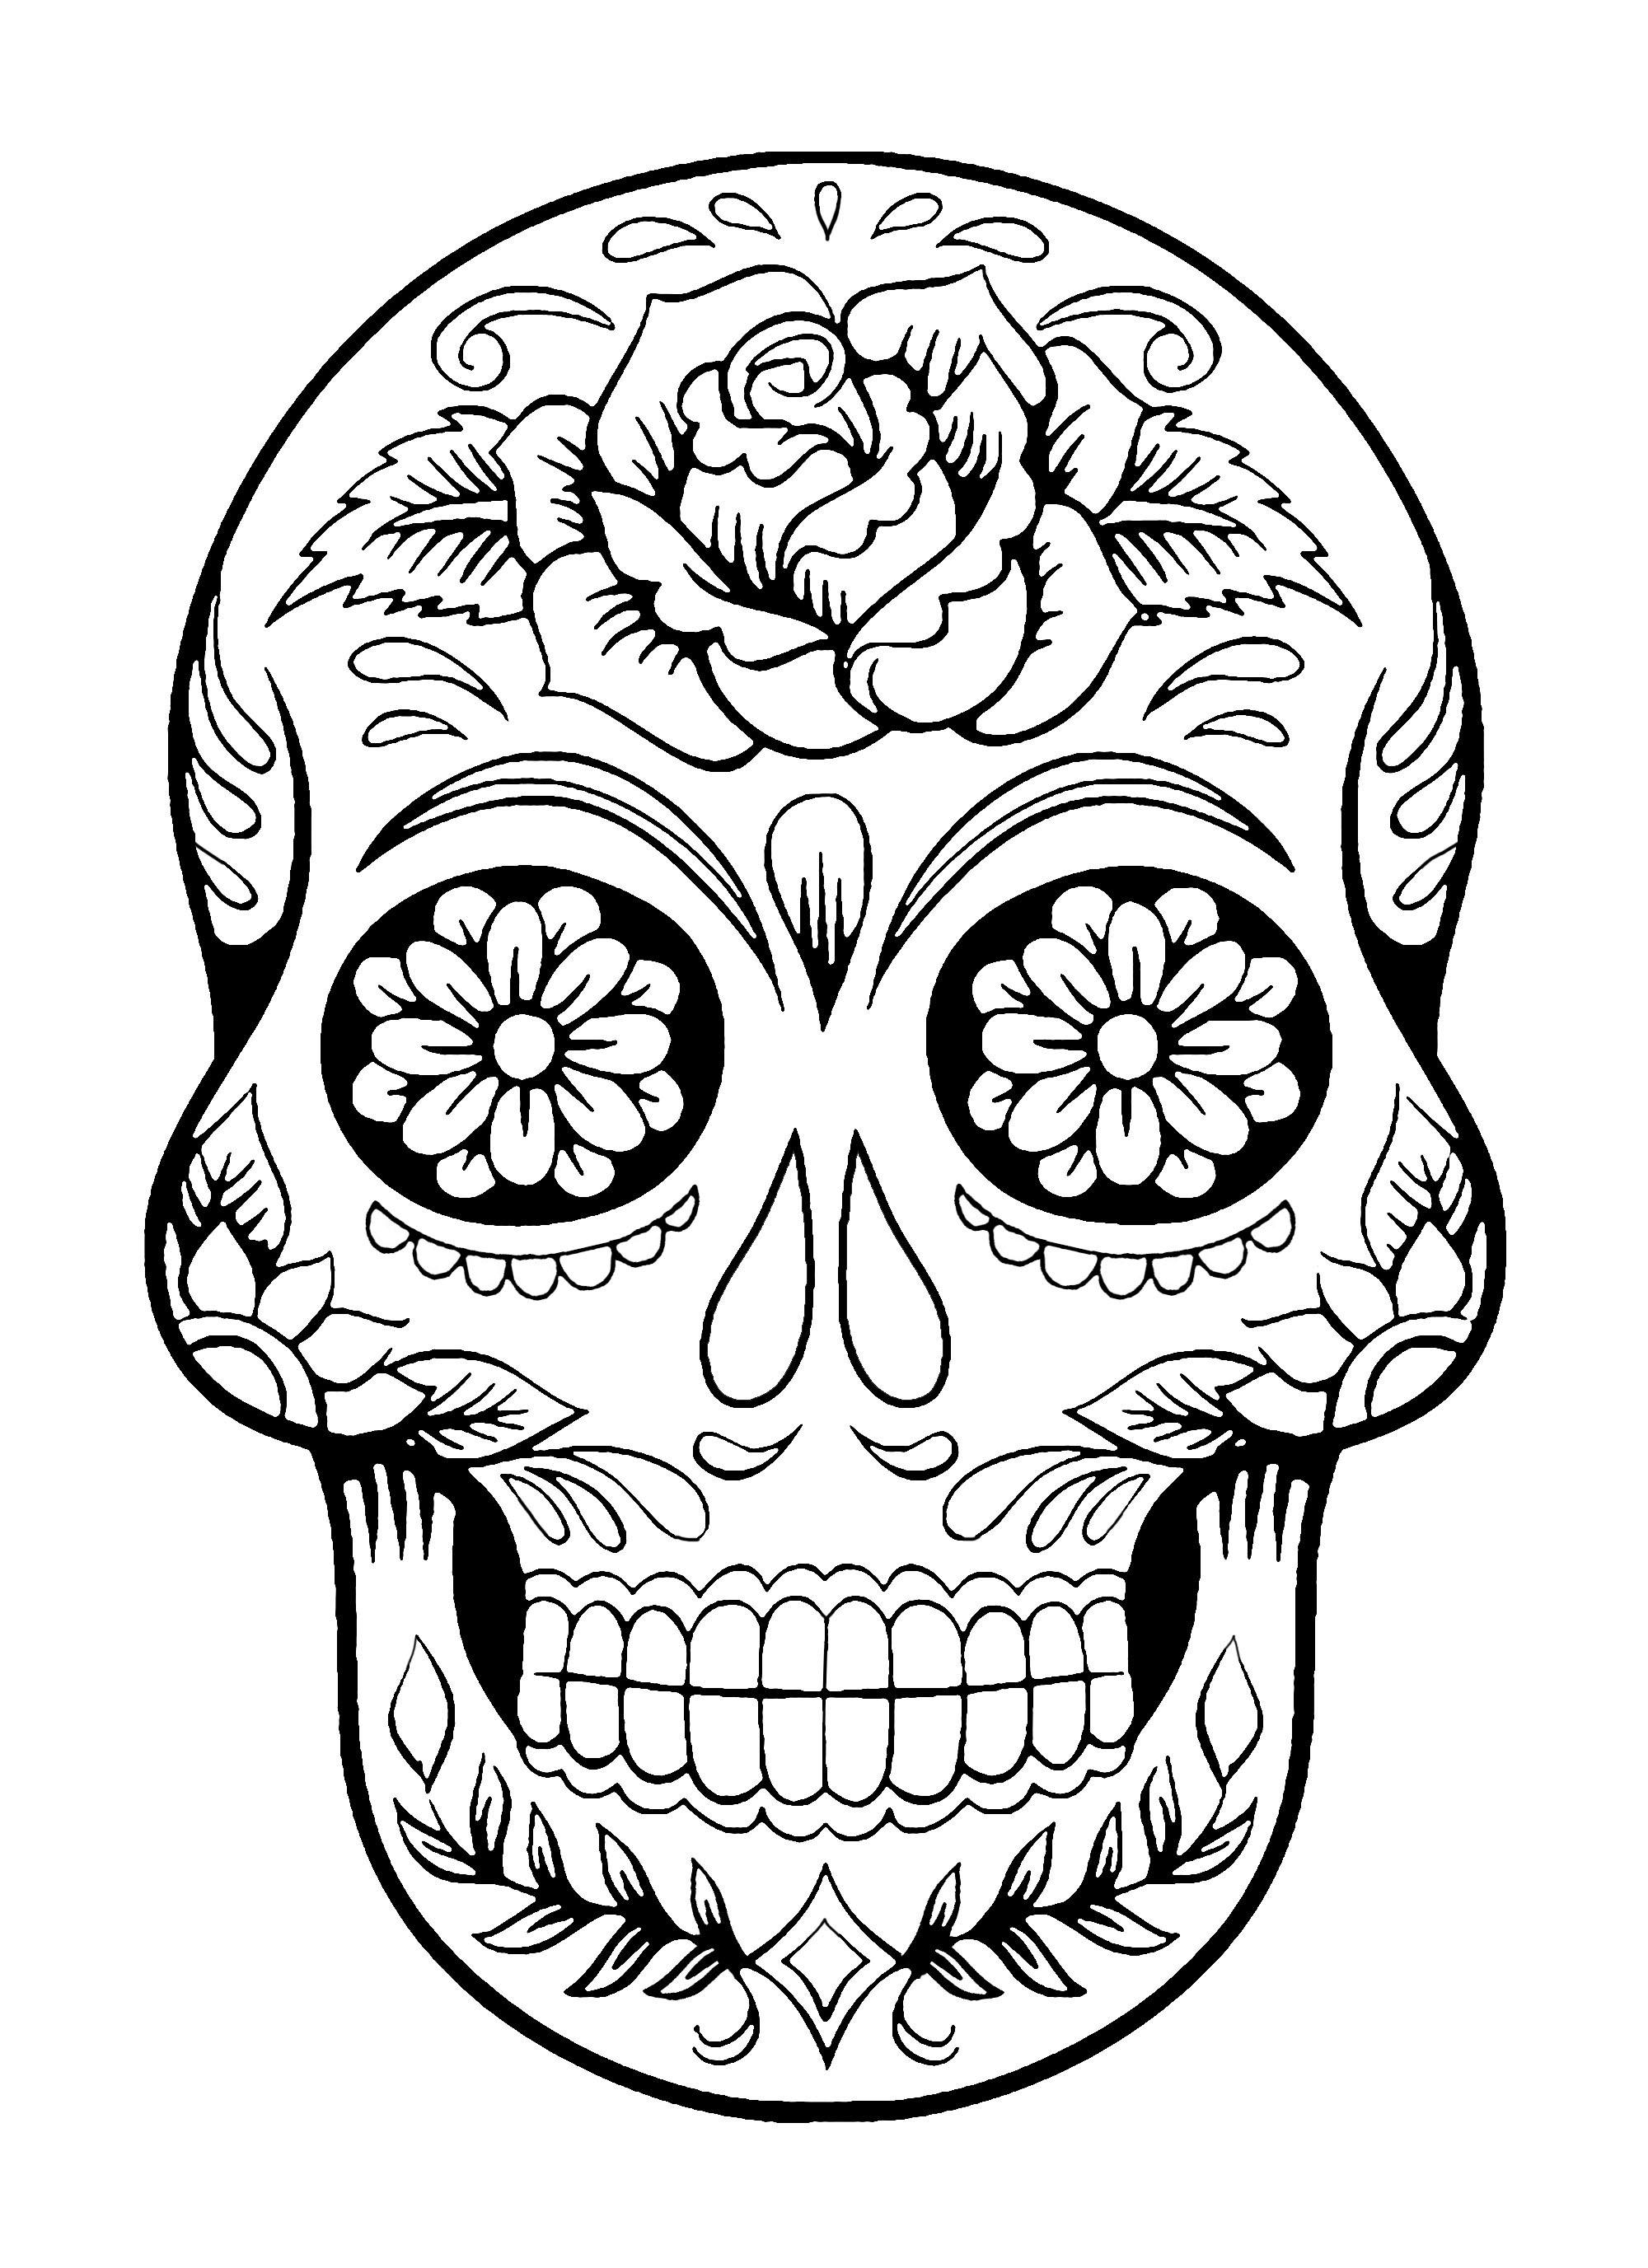 El Dia De Los Muertos 64218 El Dia De Los Muertos